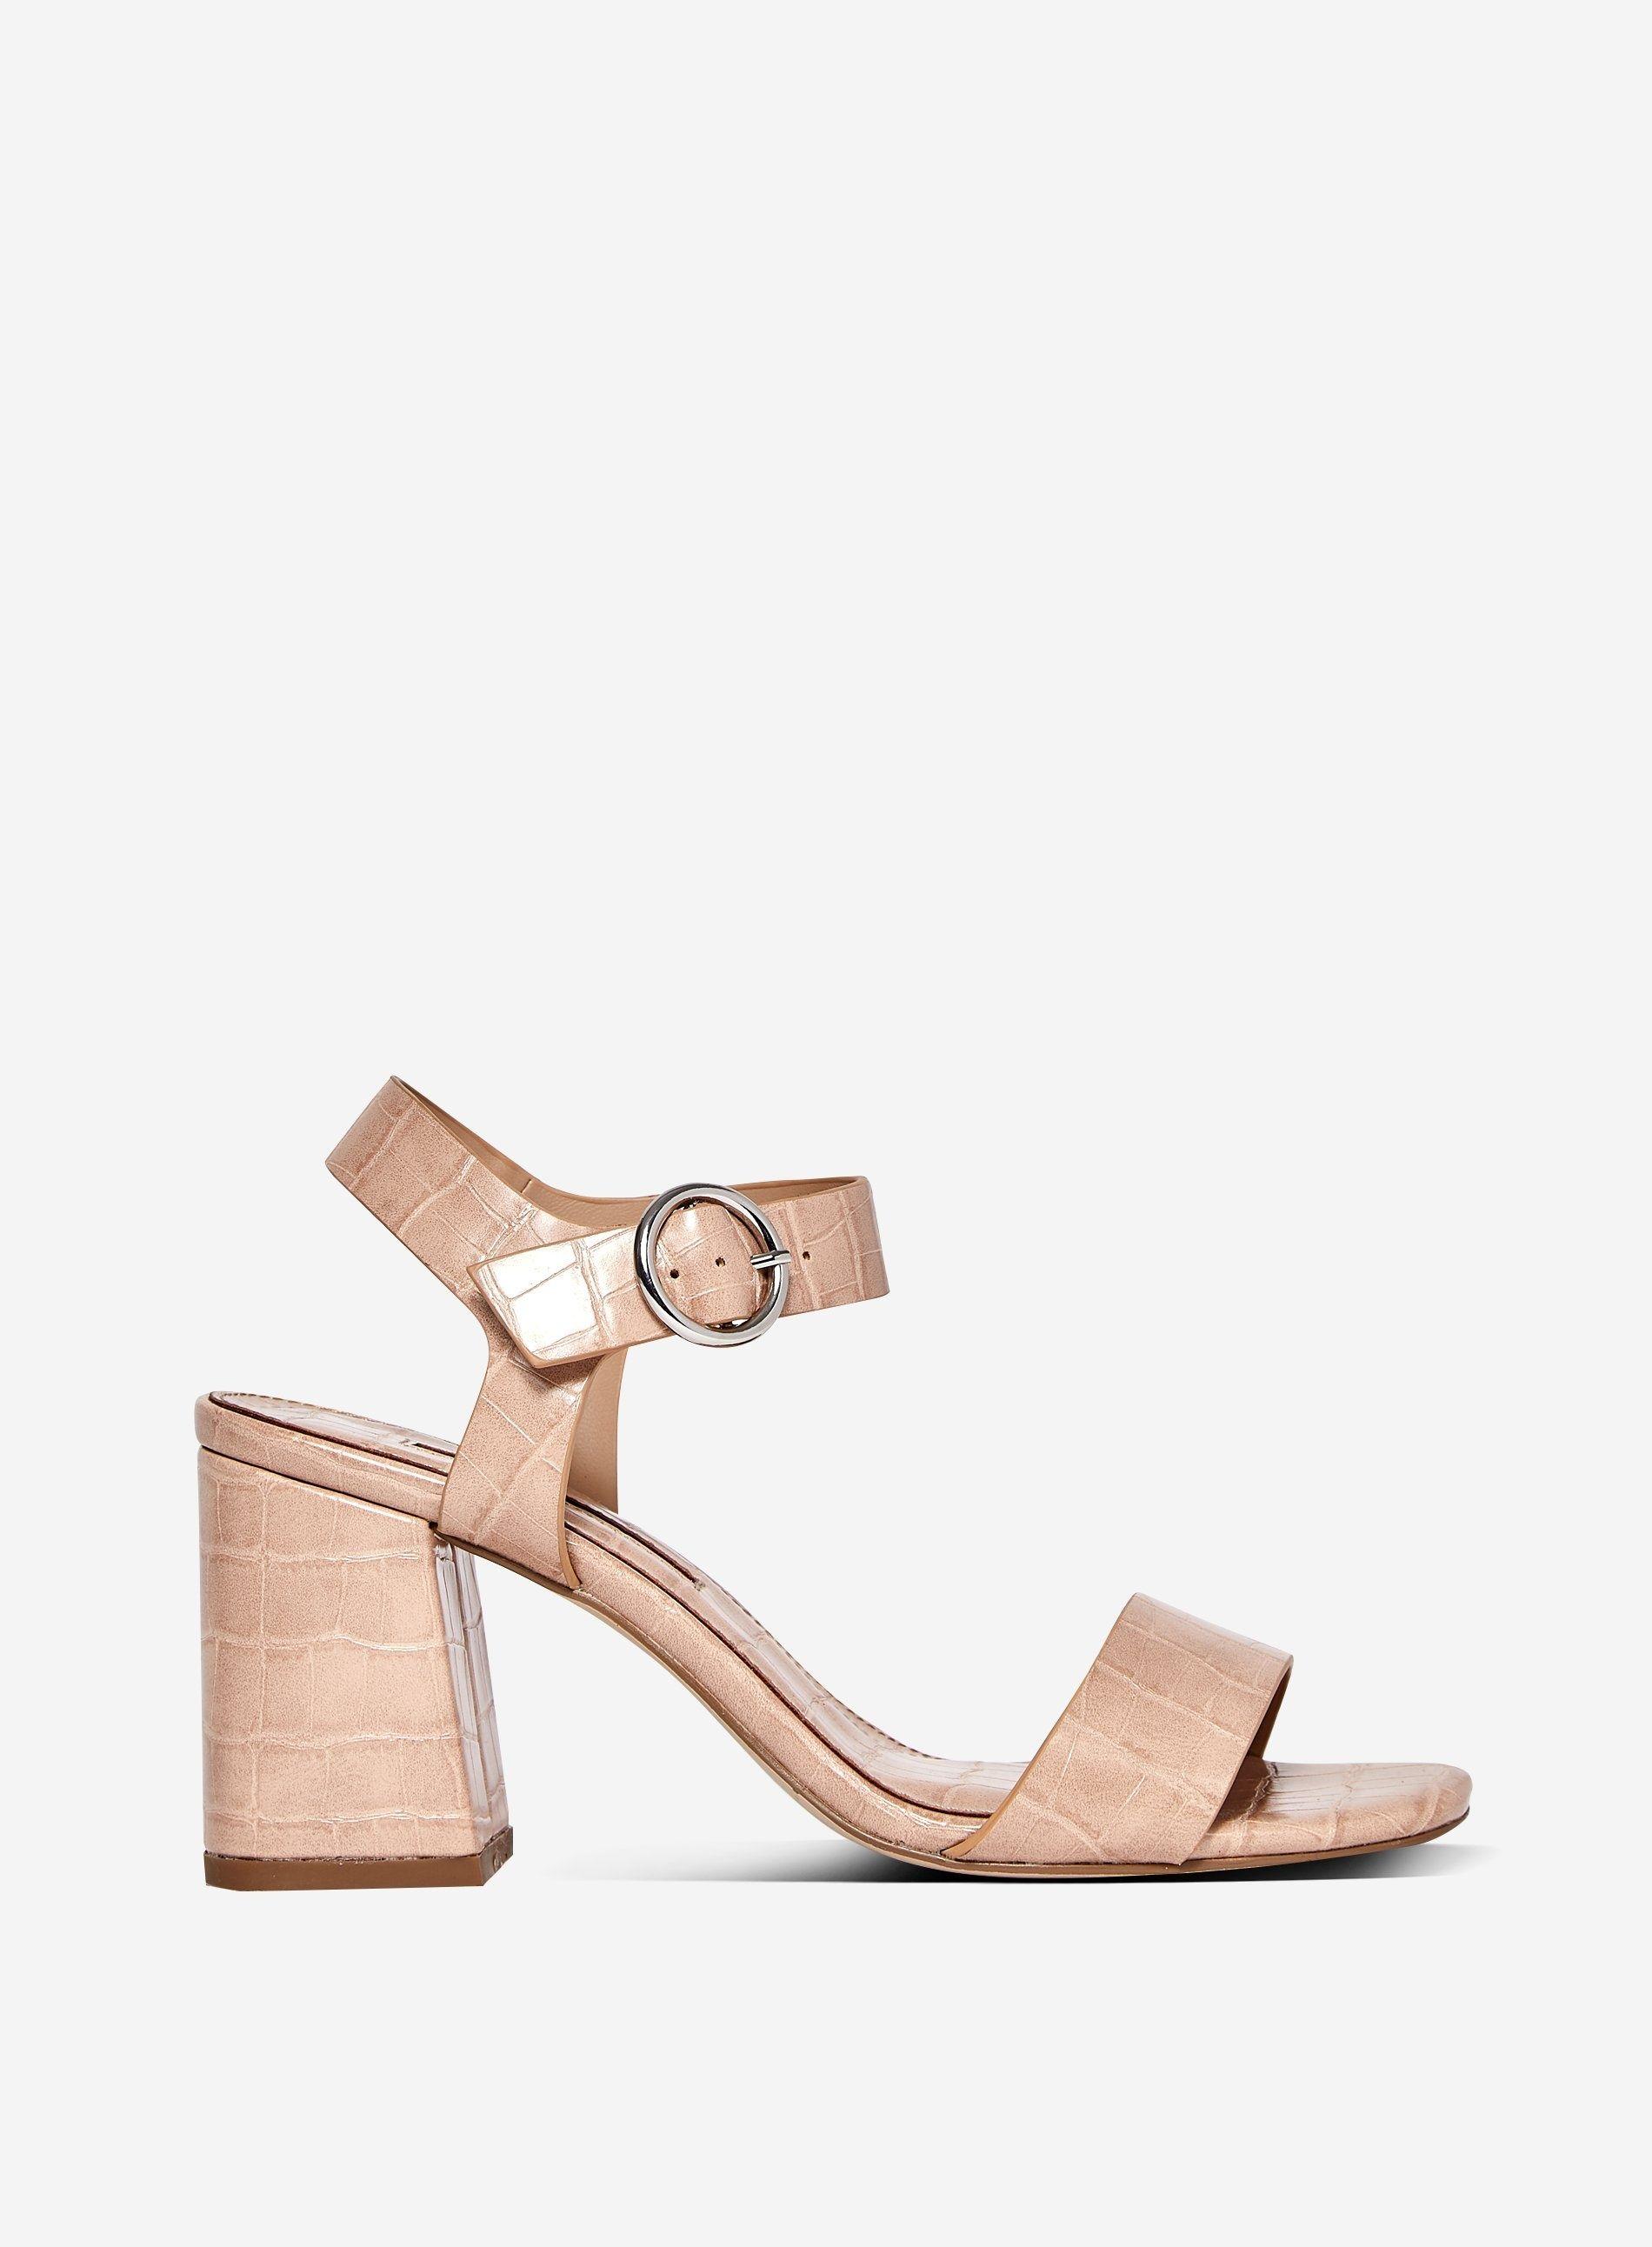 Dorothy Perkins Womens Pink Scorpio Crocodile Design Sandals Open Toe Shoes